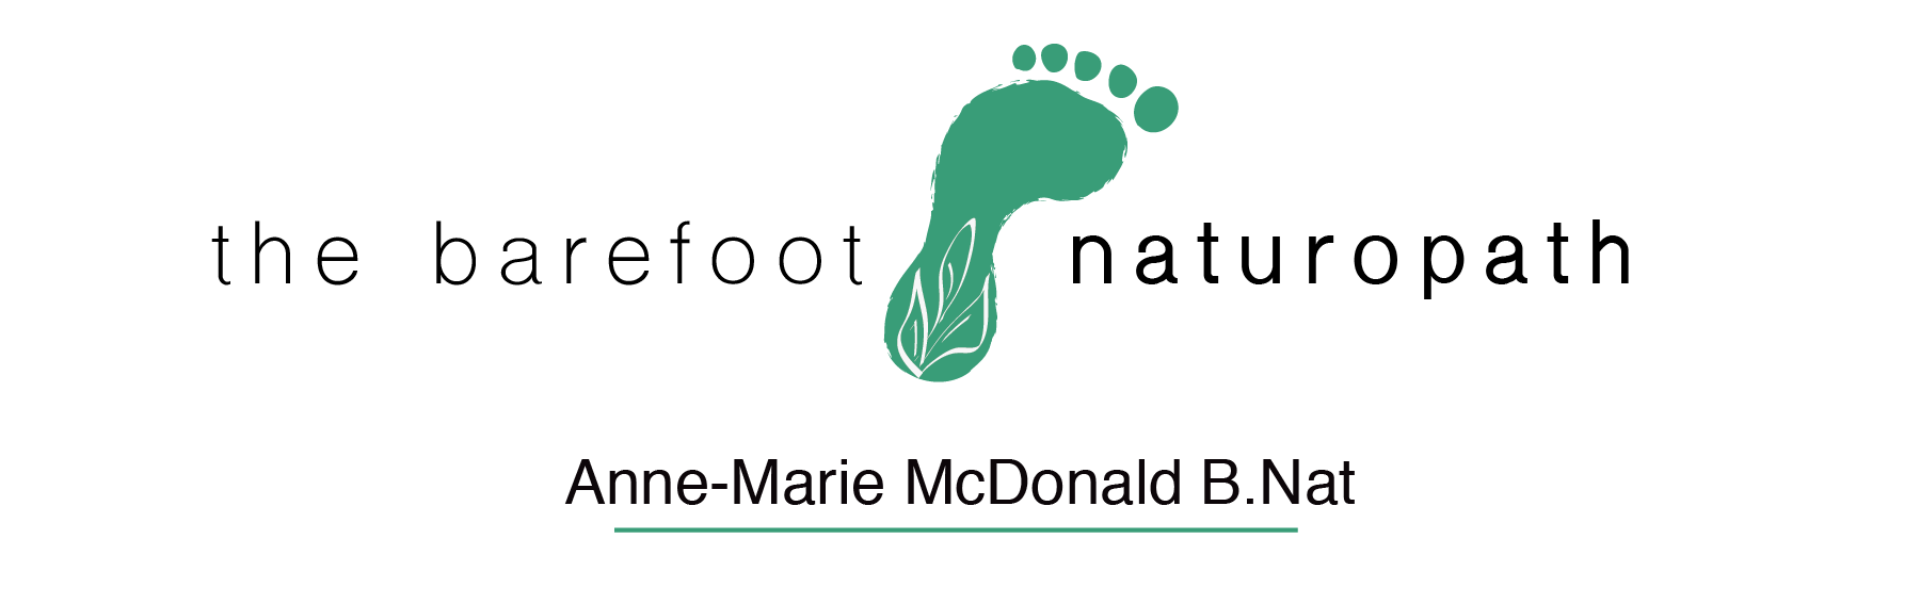 The Barefoot Naturopath